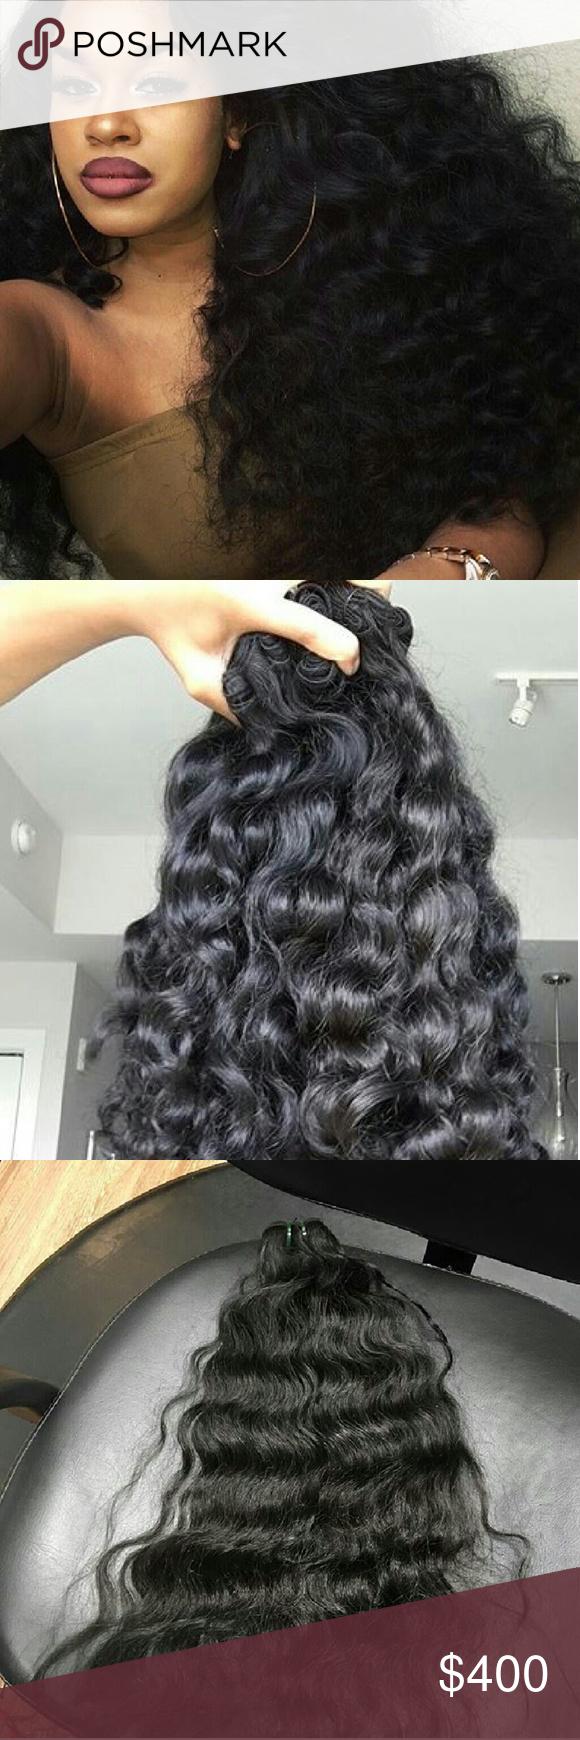 300g Virgin Hair Extensions 100g Per Bundle Origin Cambodia Approx